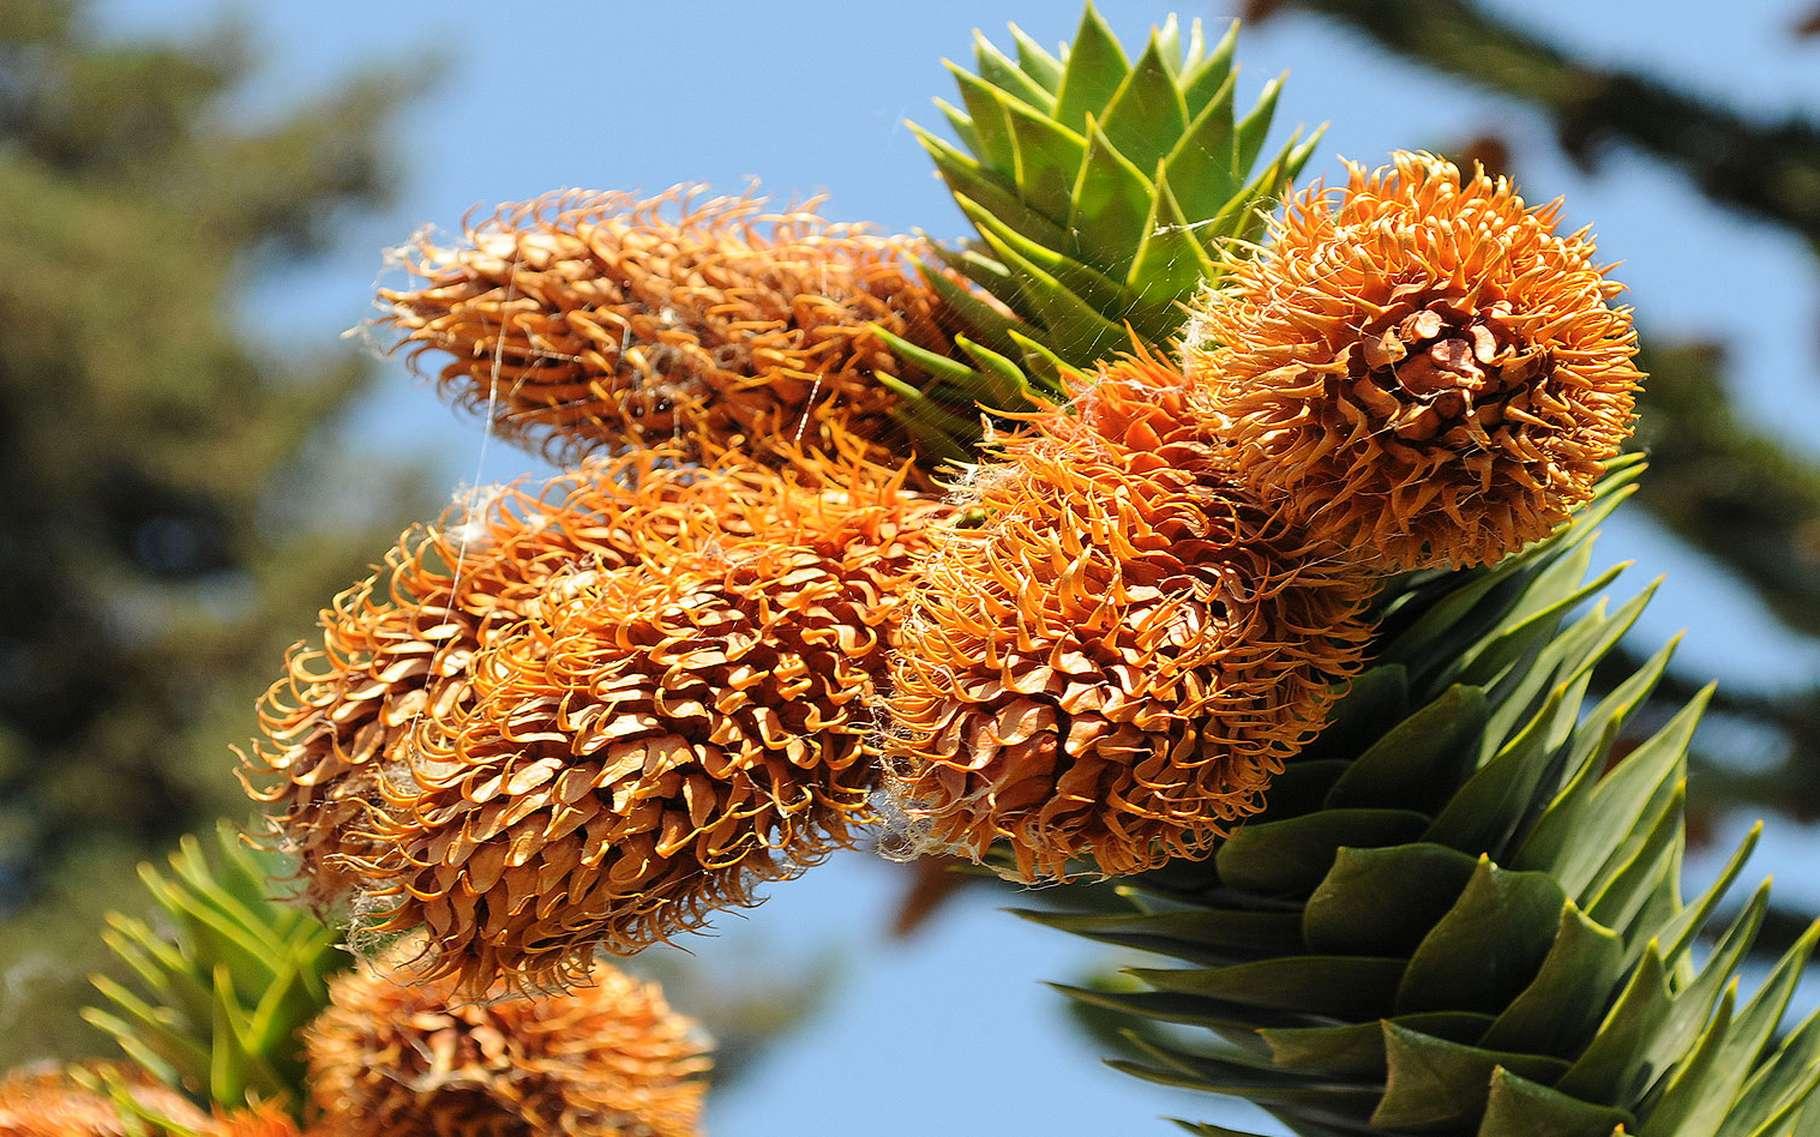 L'araucaria du Chili. © BlondeWatchmaker, Flickr CC by nc 2.0